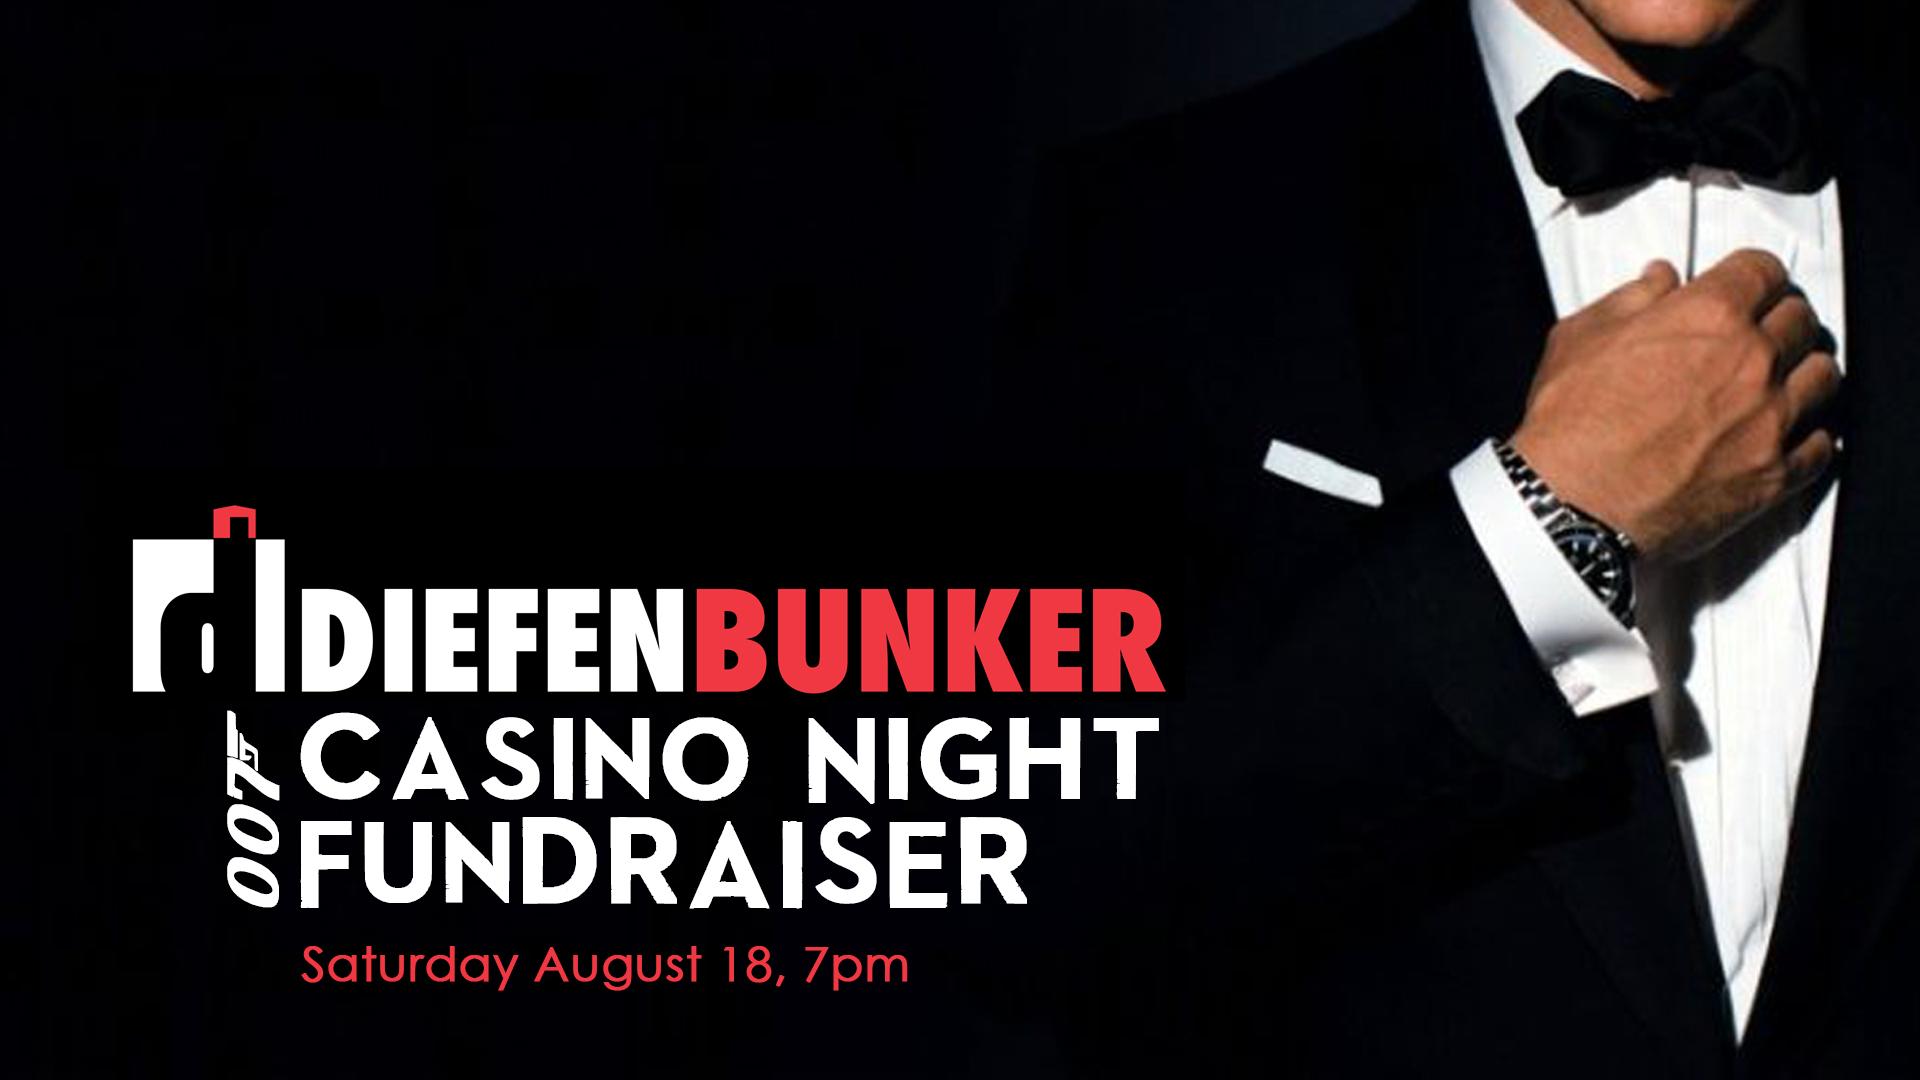 007 Casino Night Birthday Bash Fundraiser The Diefenbunker Museum